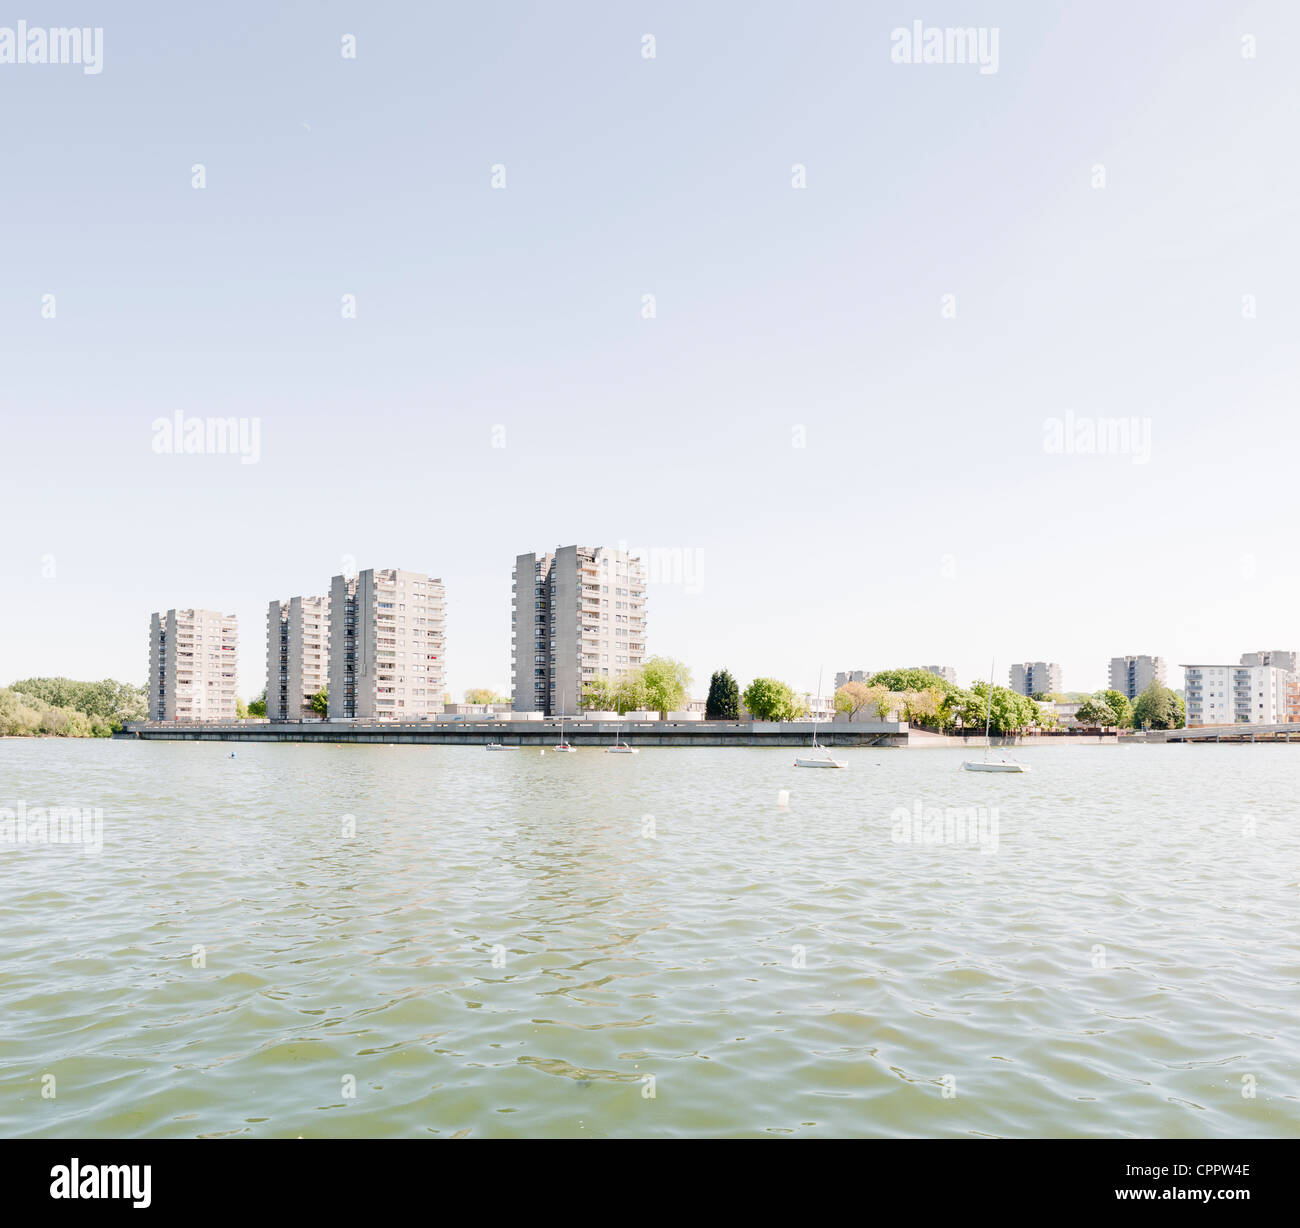 Utopian council housing in Thamesmead, London, UK. - Stock Image